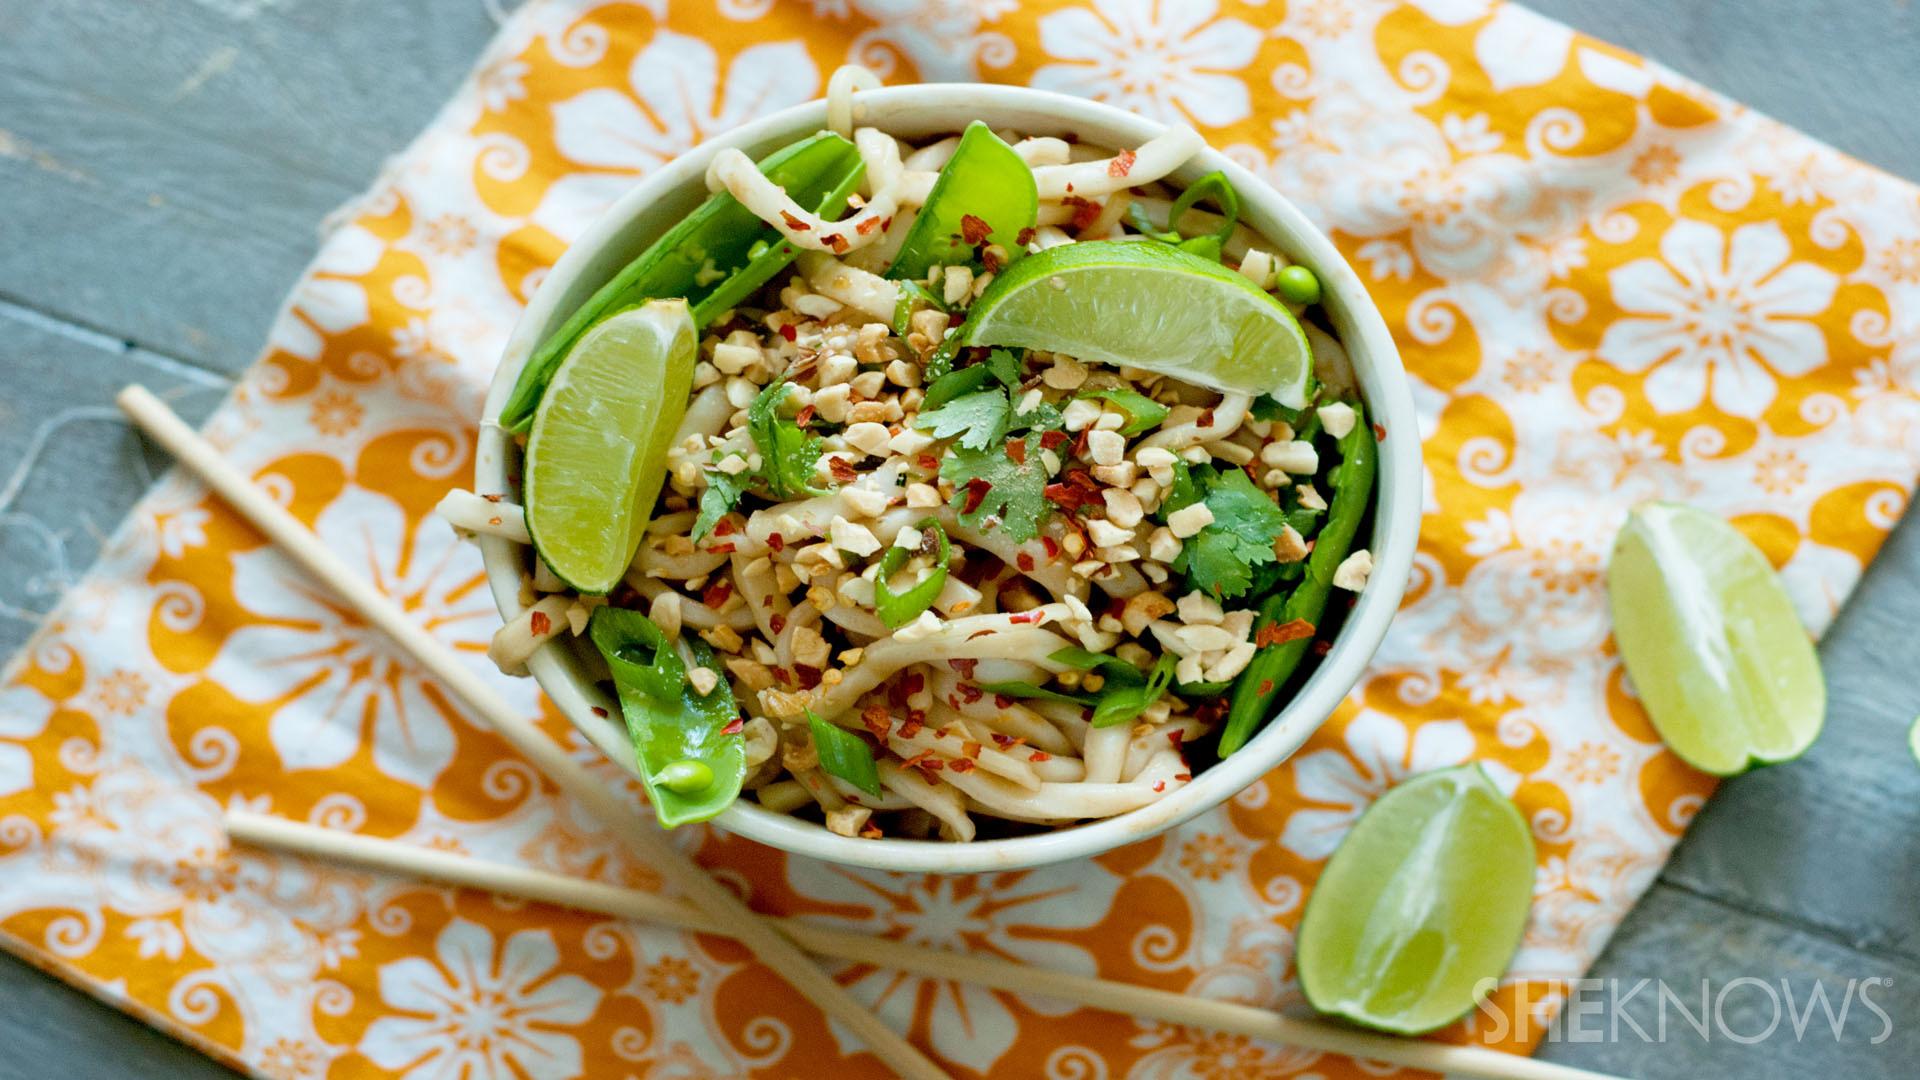 Takeout fake-out: Coconut-peanut udon noodle bowls